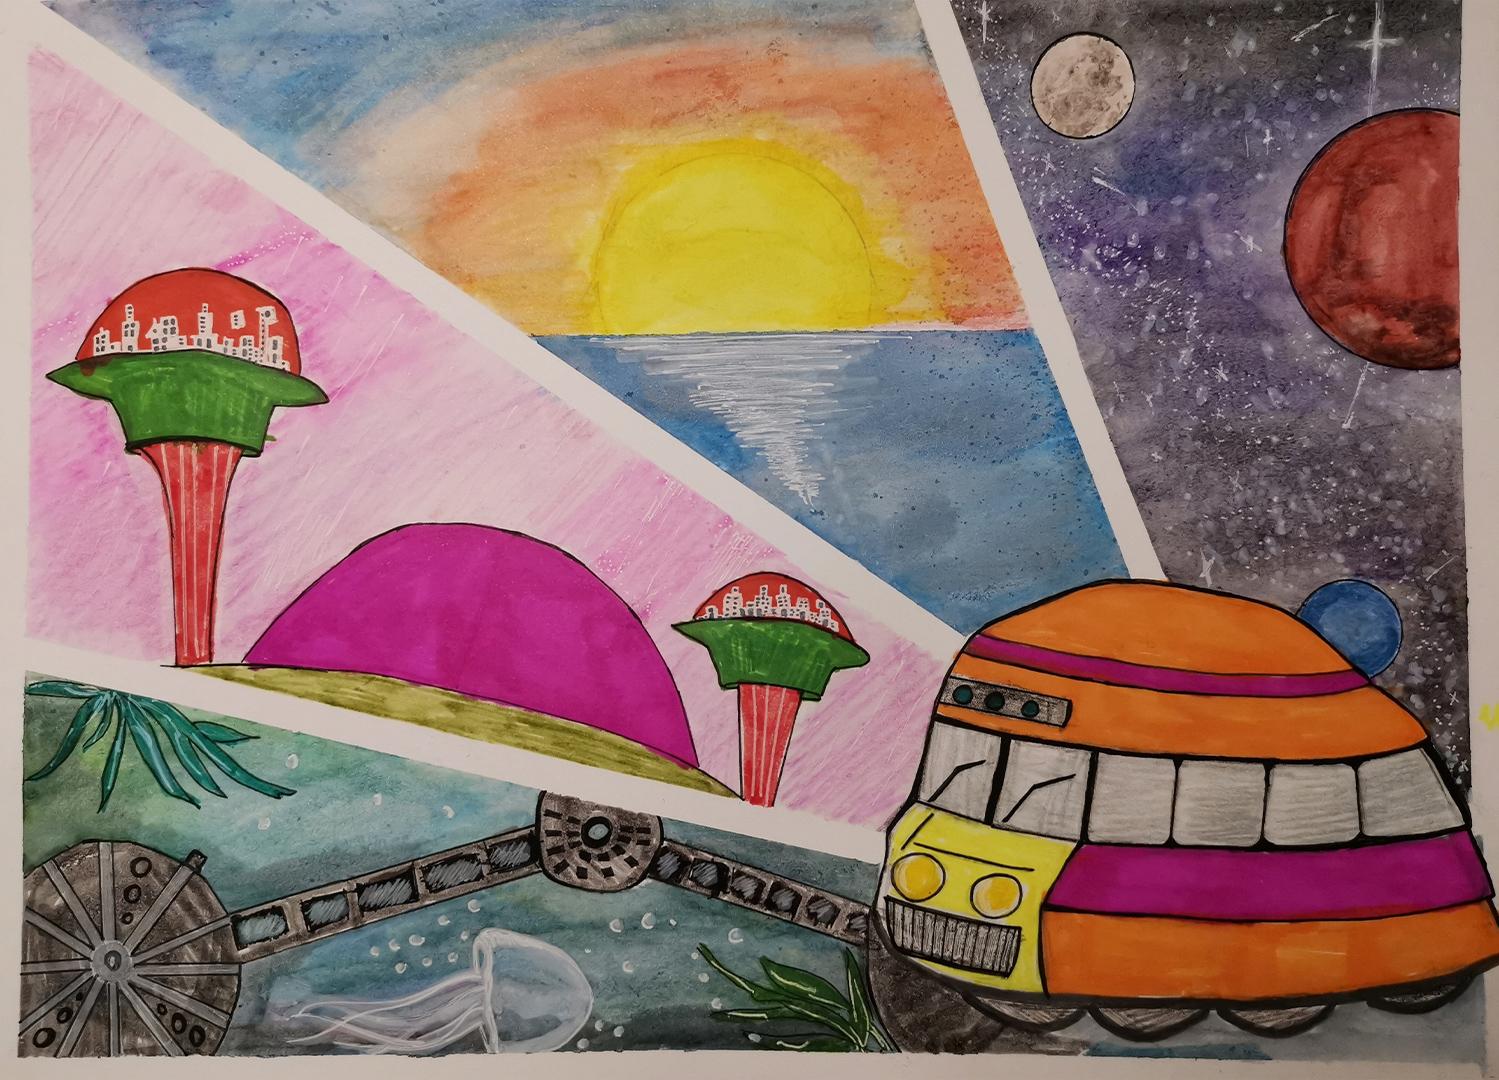 Magic School Bus, Maya Maksymenko, age 5